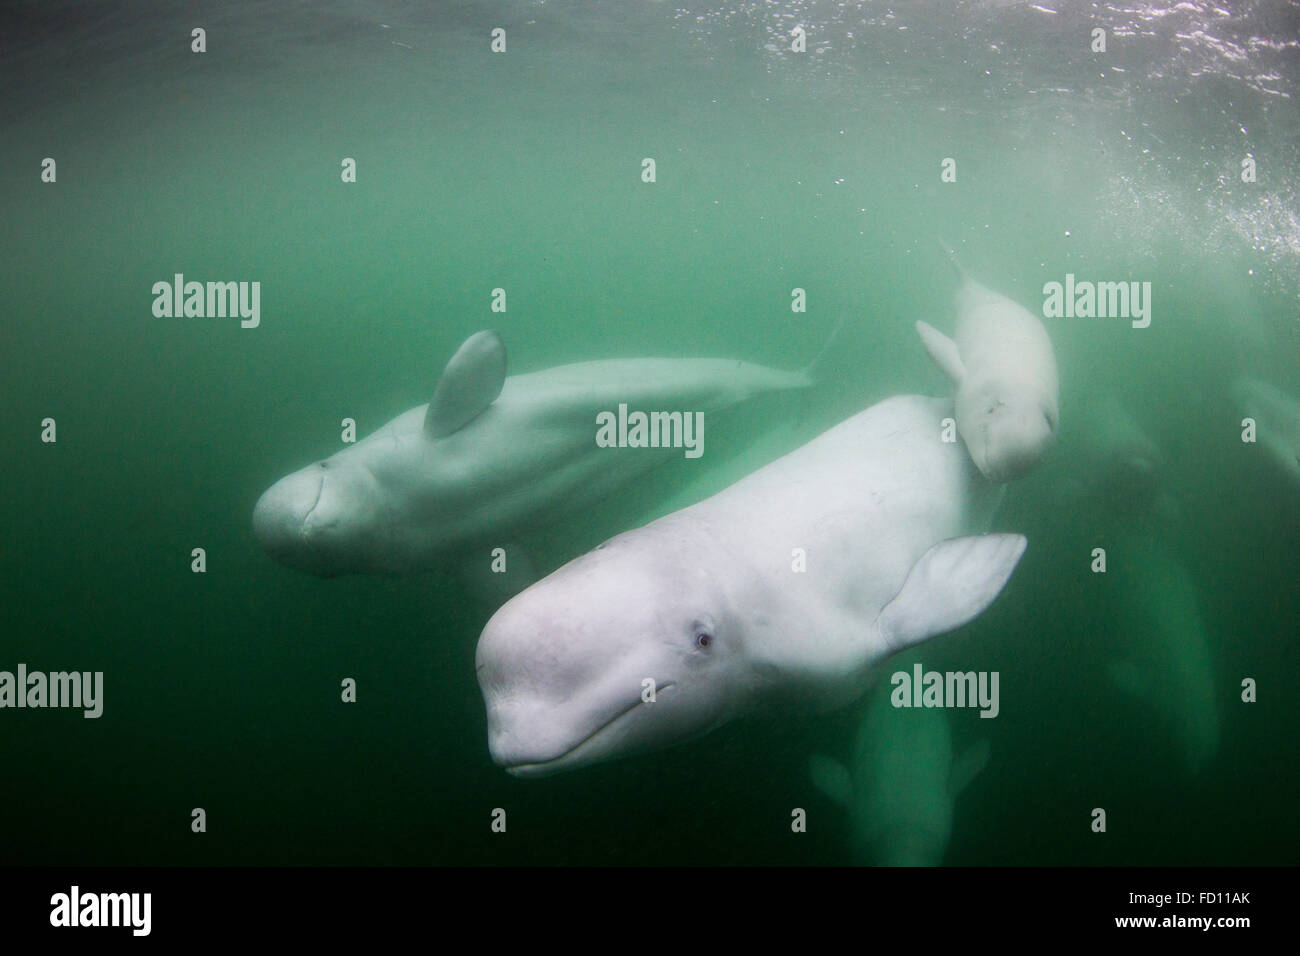 Beluga Whales Canada Stock Photos & Beluga Whales Canada Stock ...